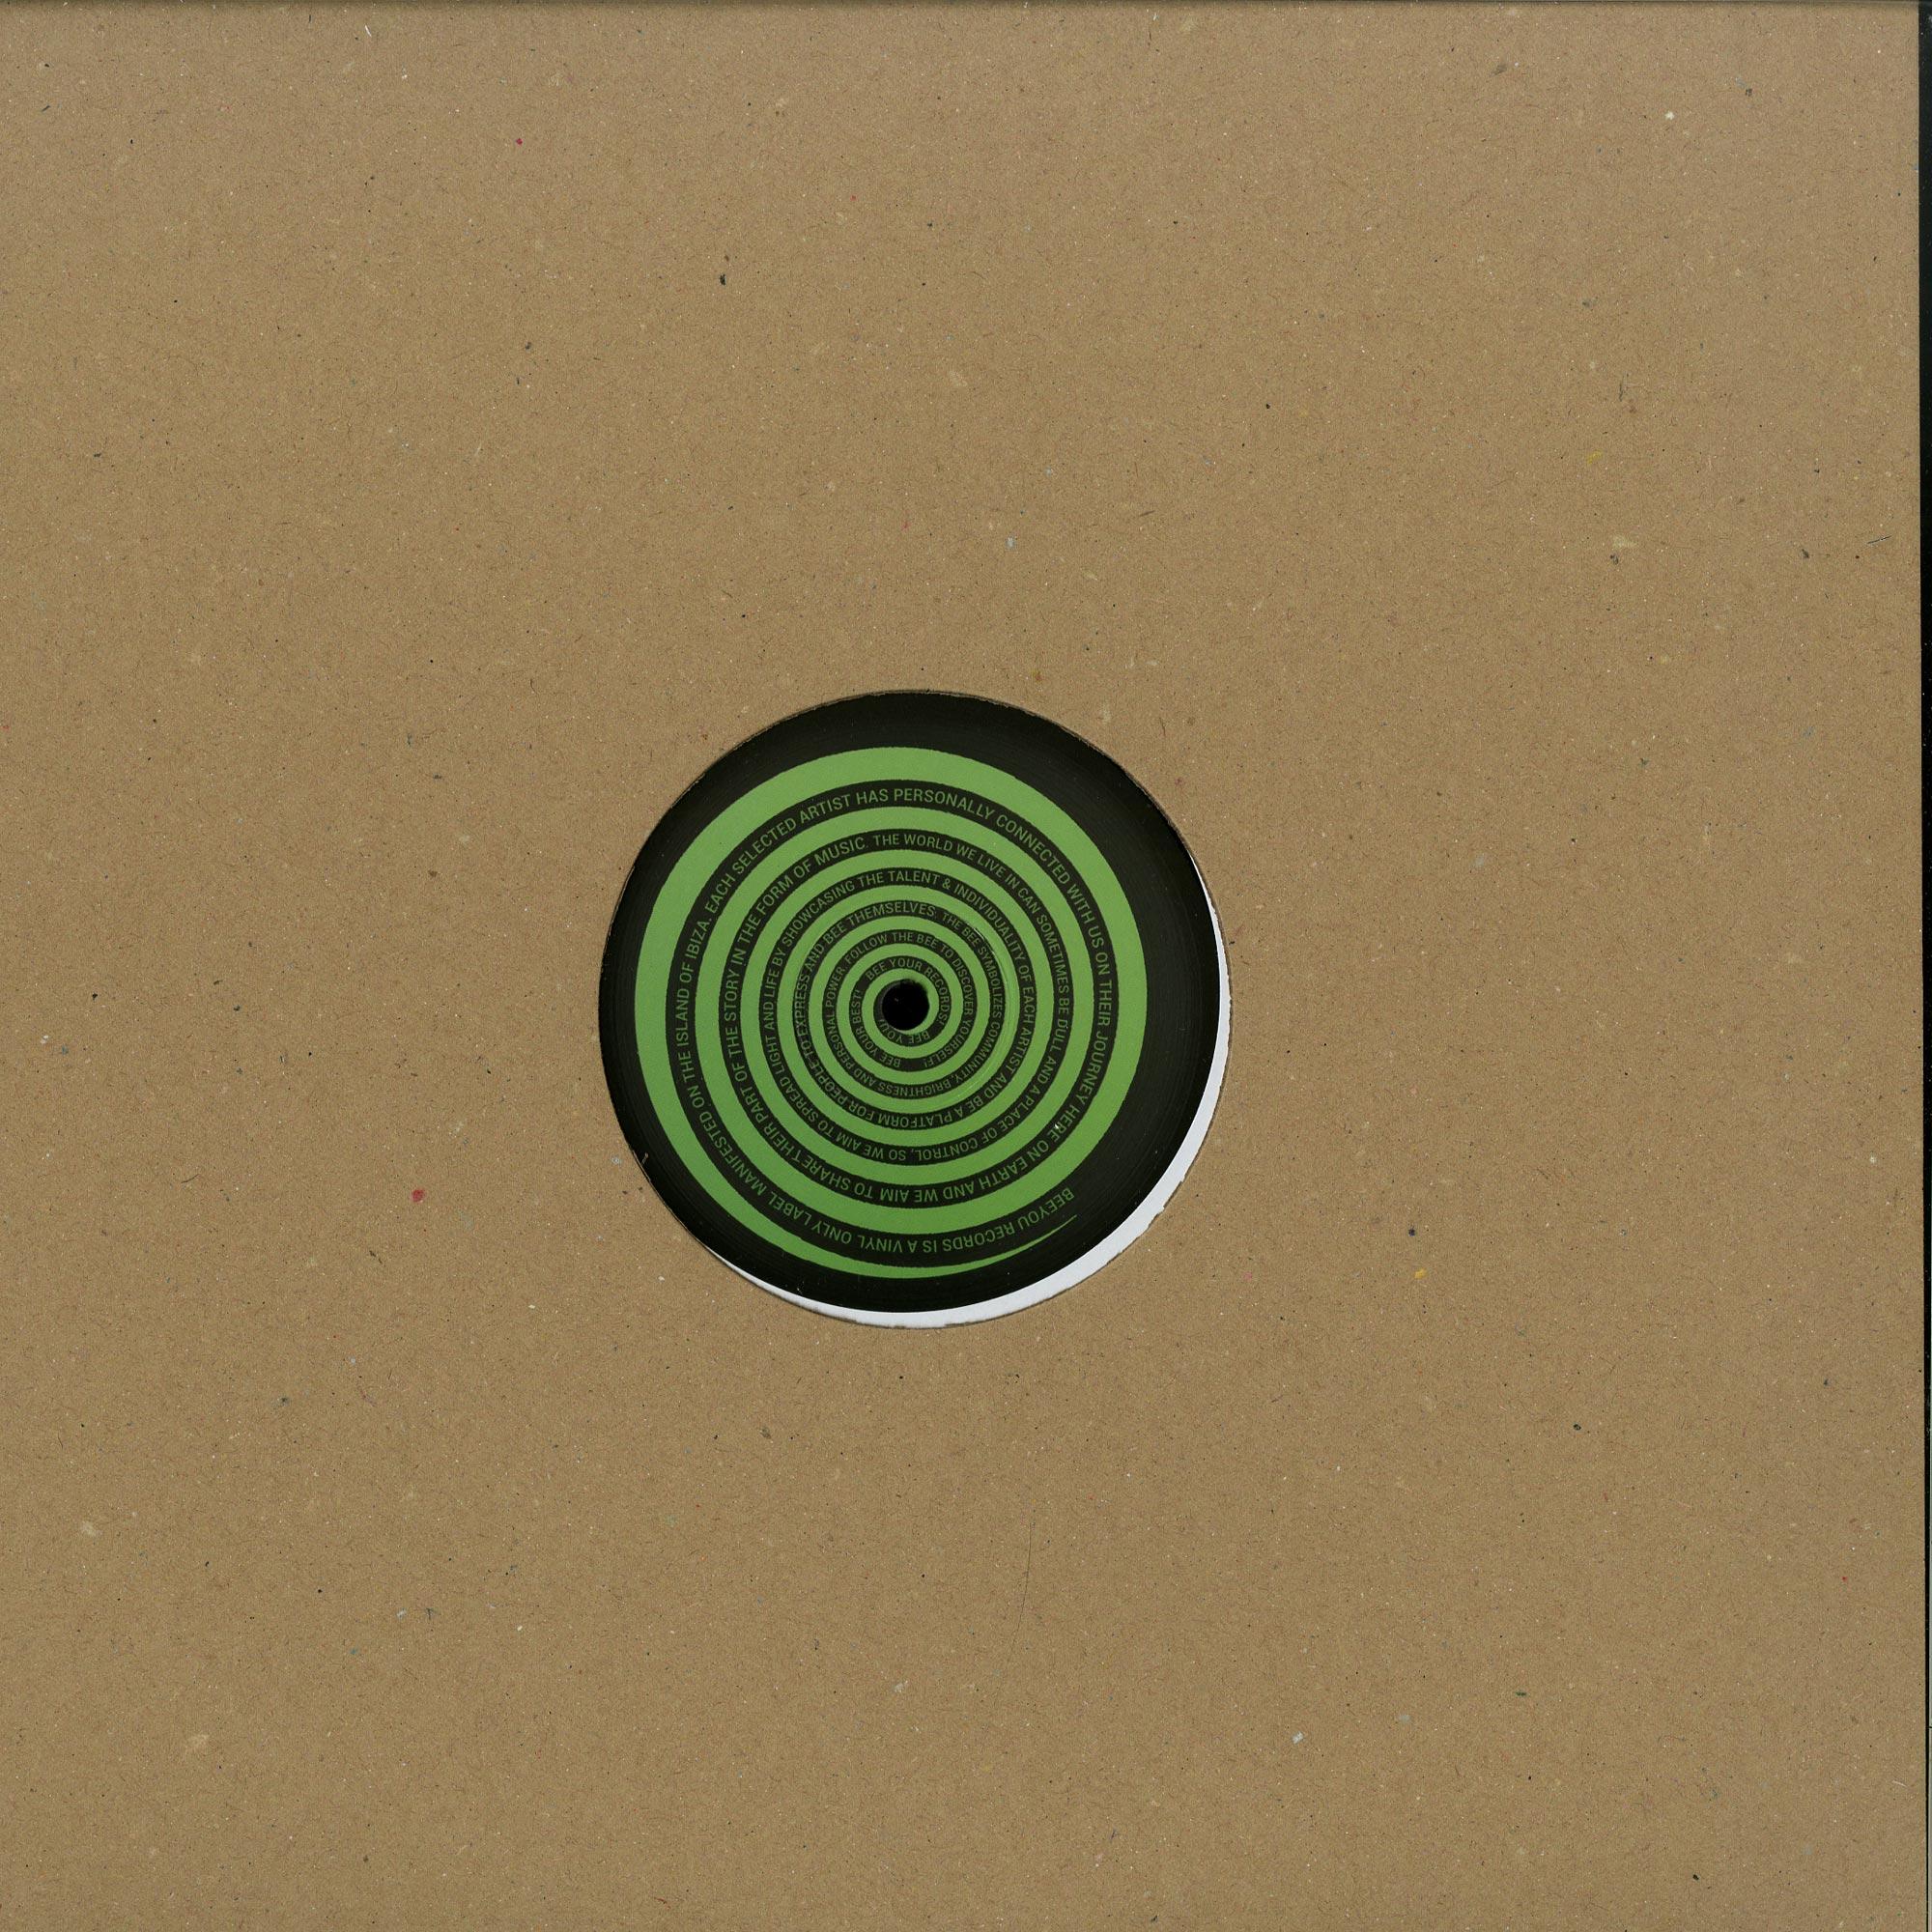 Illi / Joe Rolet - MARJORAM EP